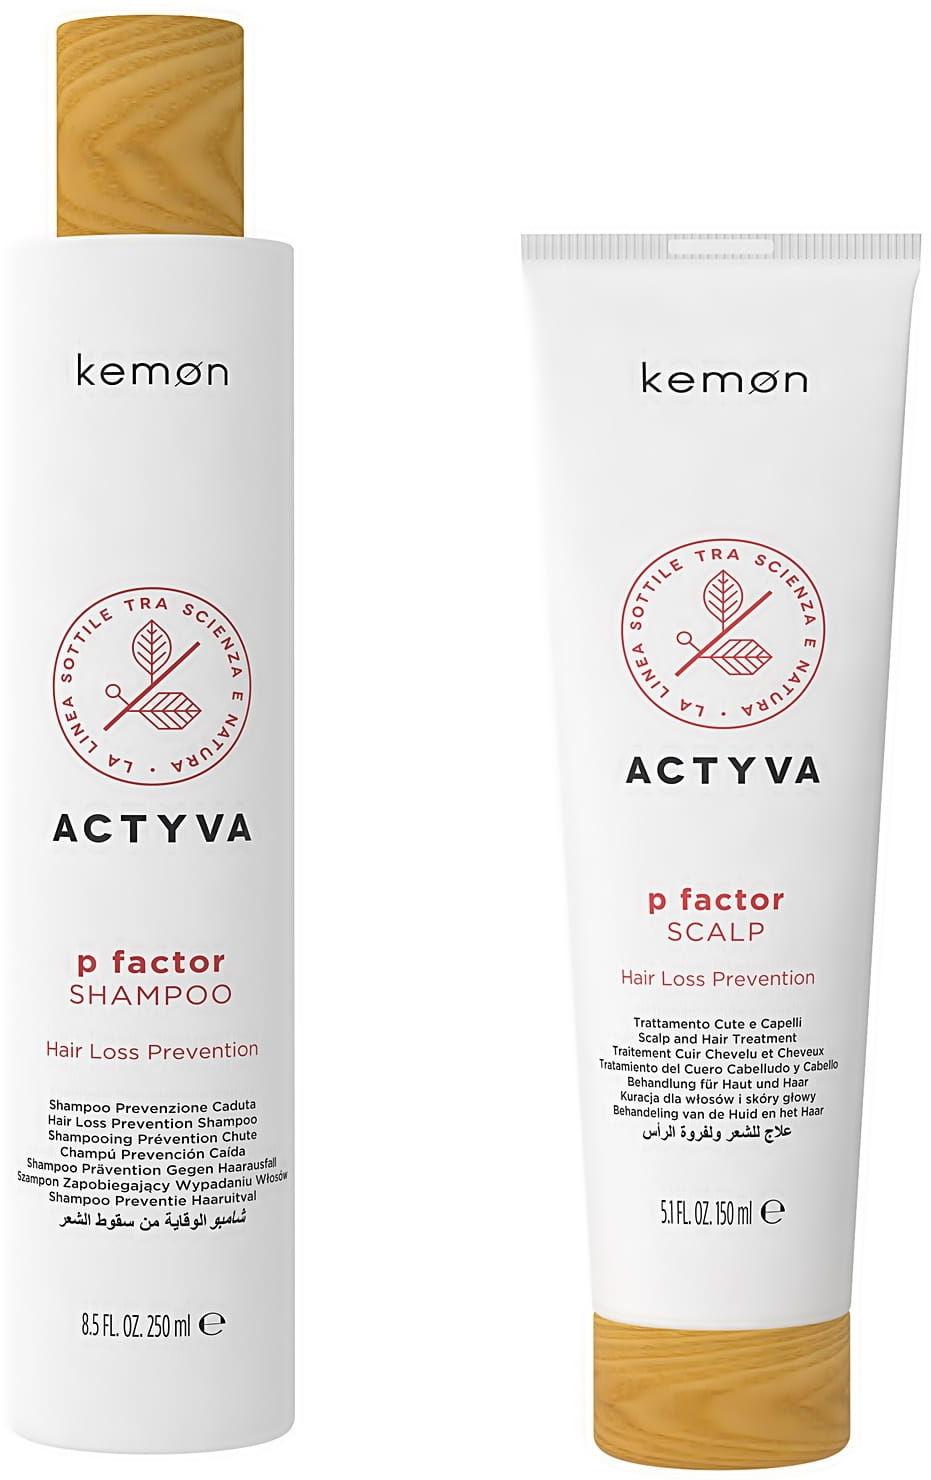 Kemon Actyva P Factor zestaw szampon 250ml + odżywka 150ml